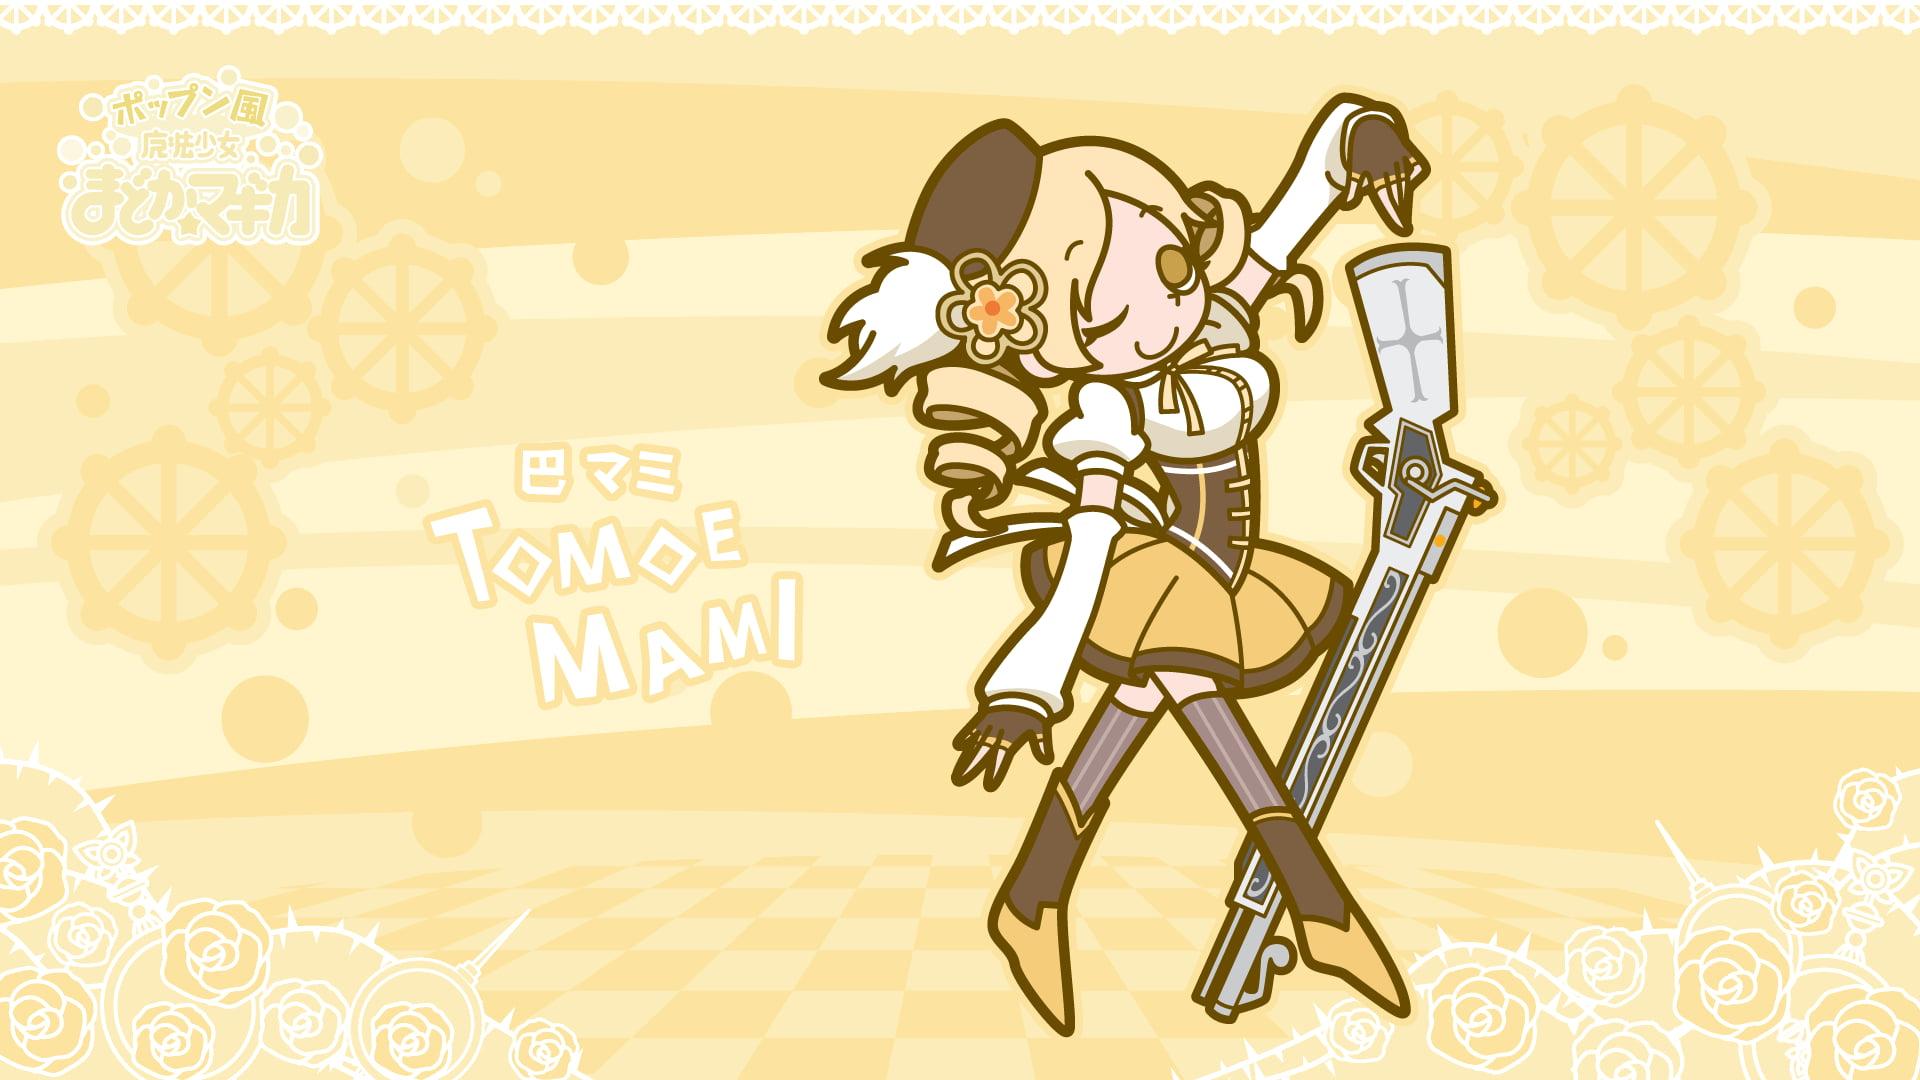 Tomoe Mami clipart, Mahou Shoujo Madoka Magica, Tomoe Mami.